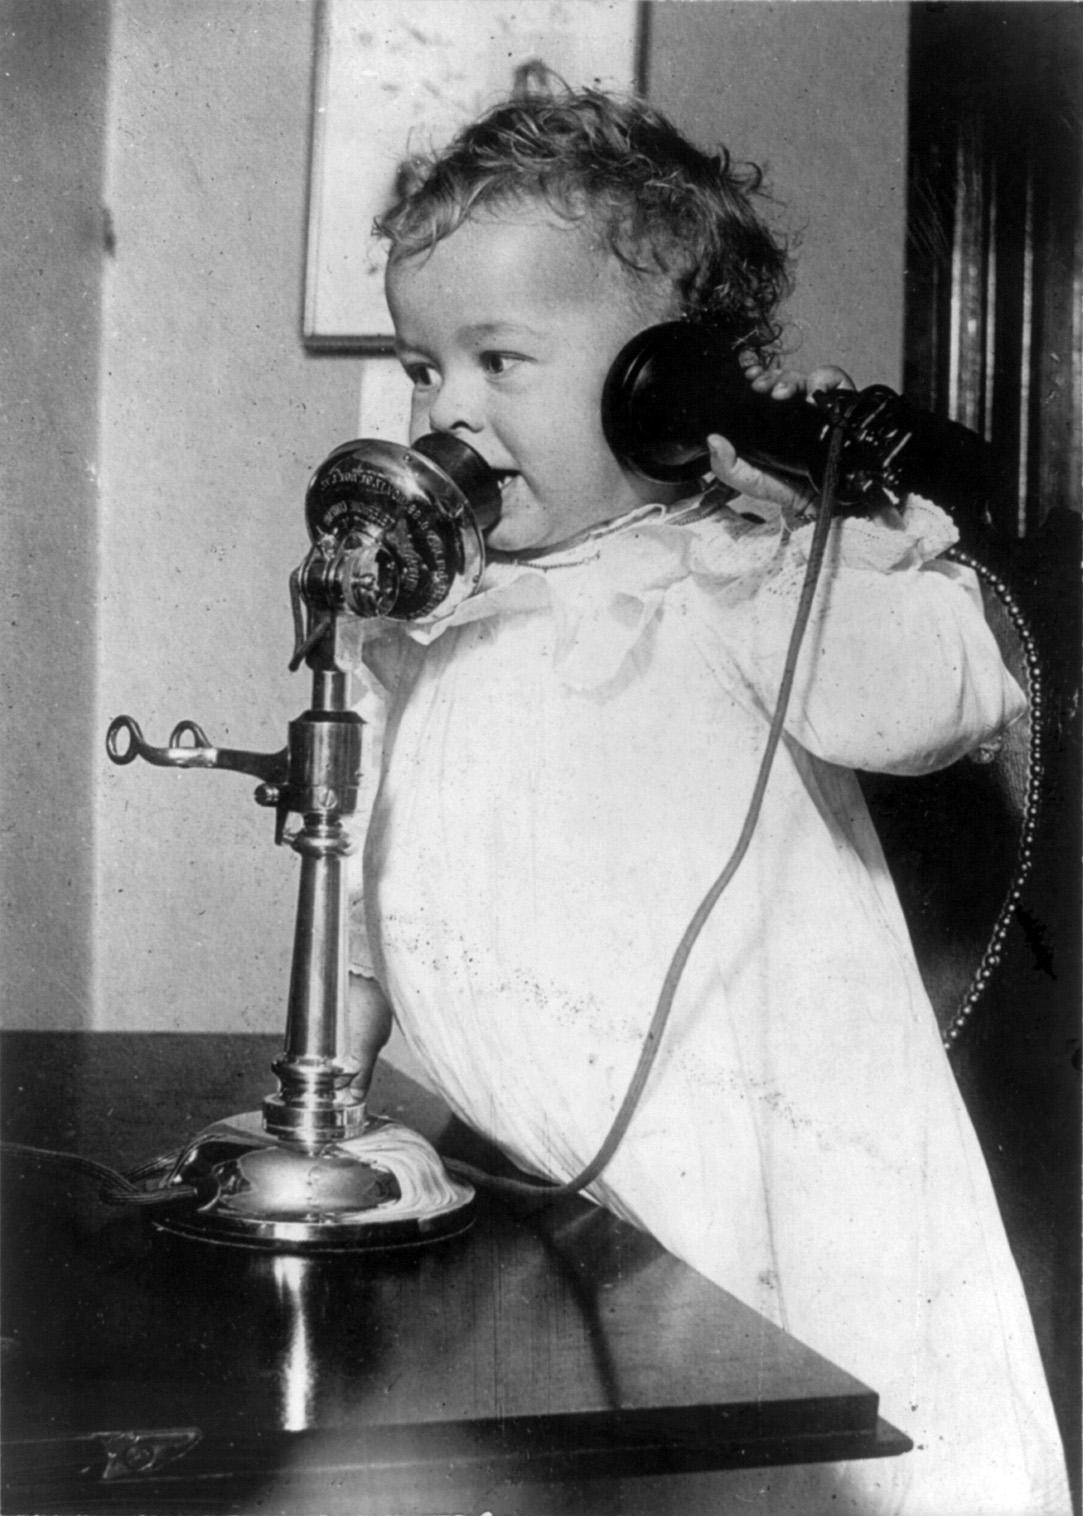 Kuvahaun tulos haulle child telephone wikimedia commons